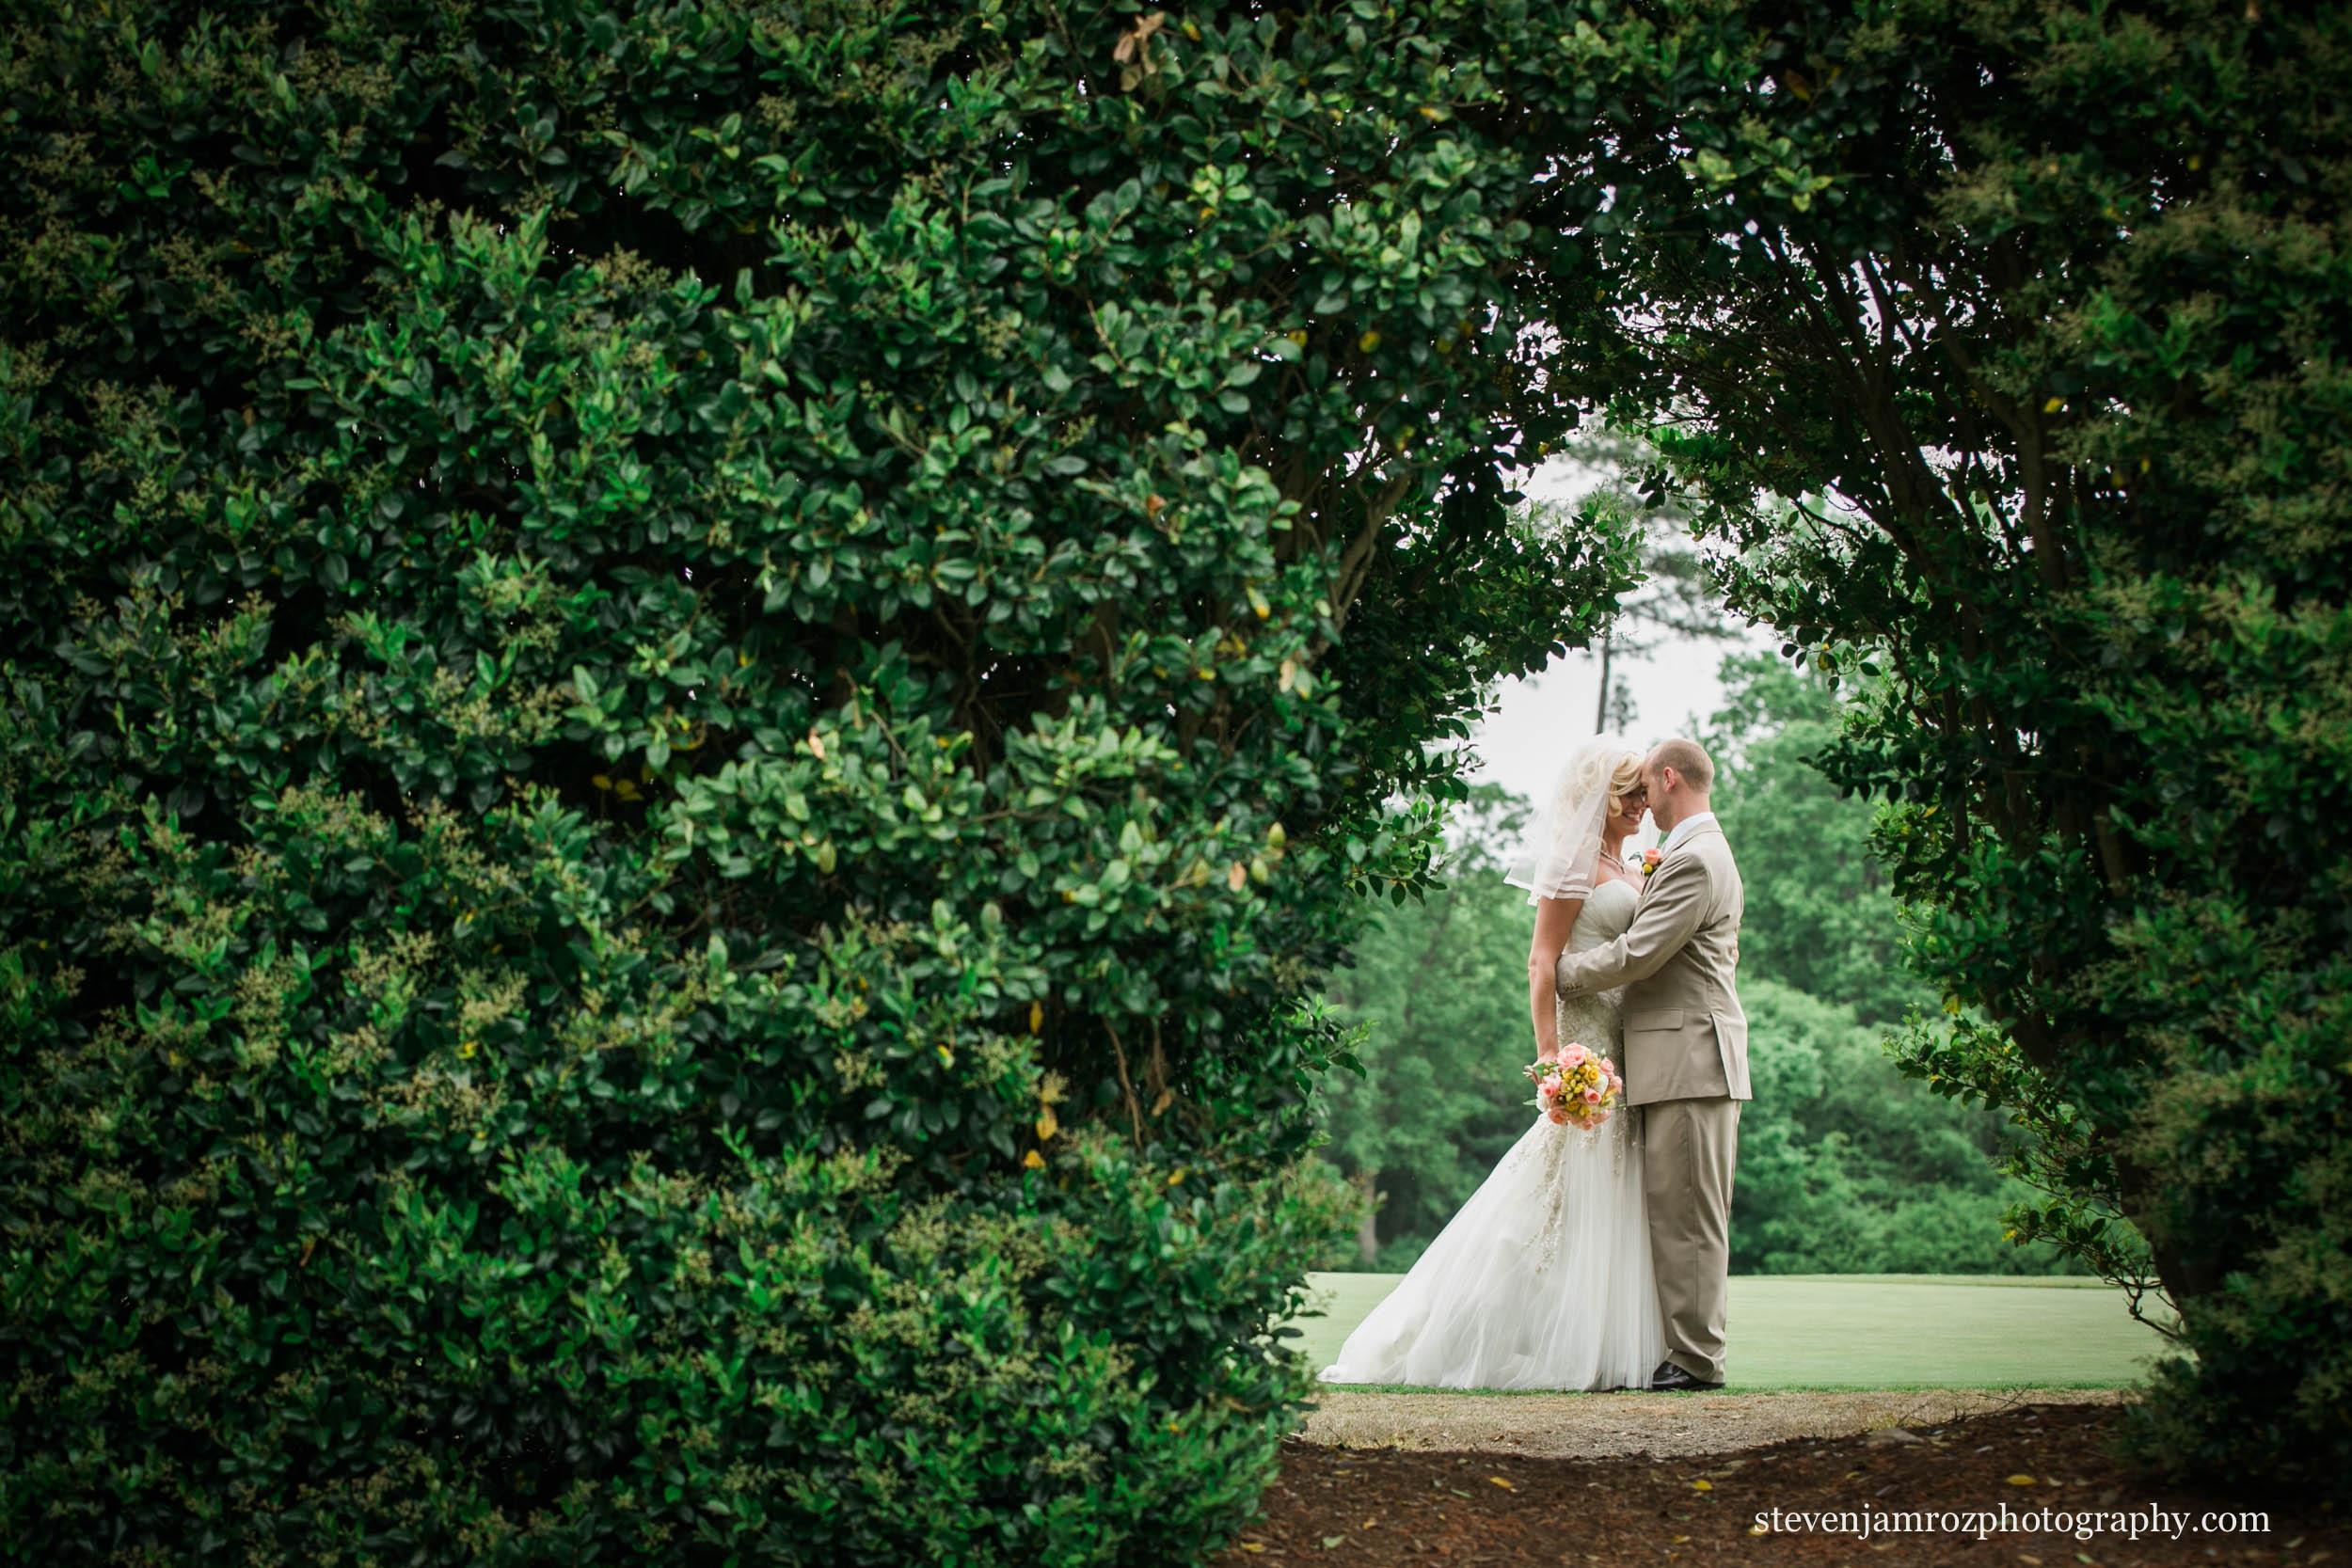 arbor-wedding-steven-jamroz-photography-0533.jpg